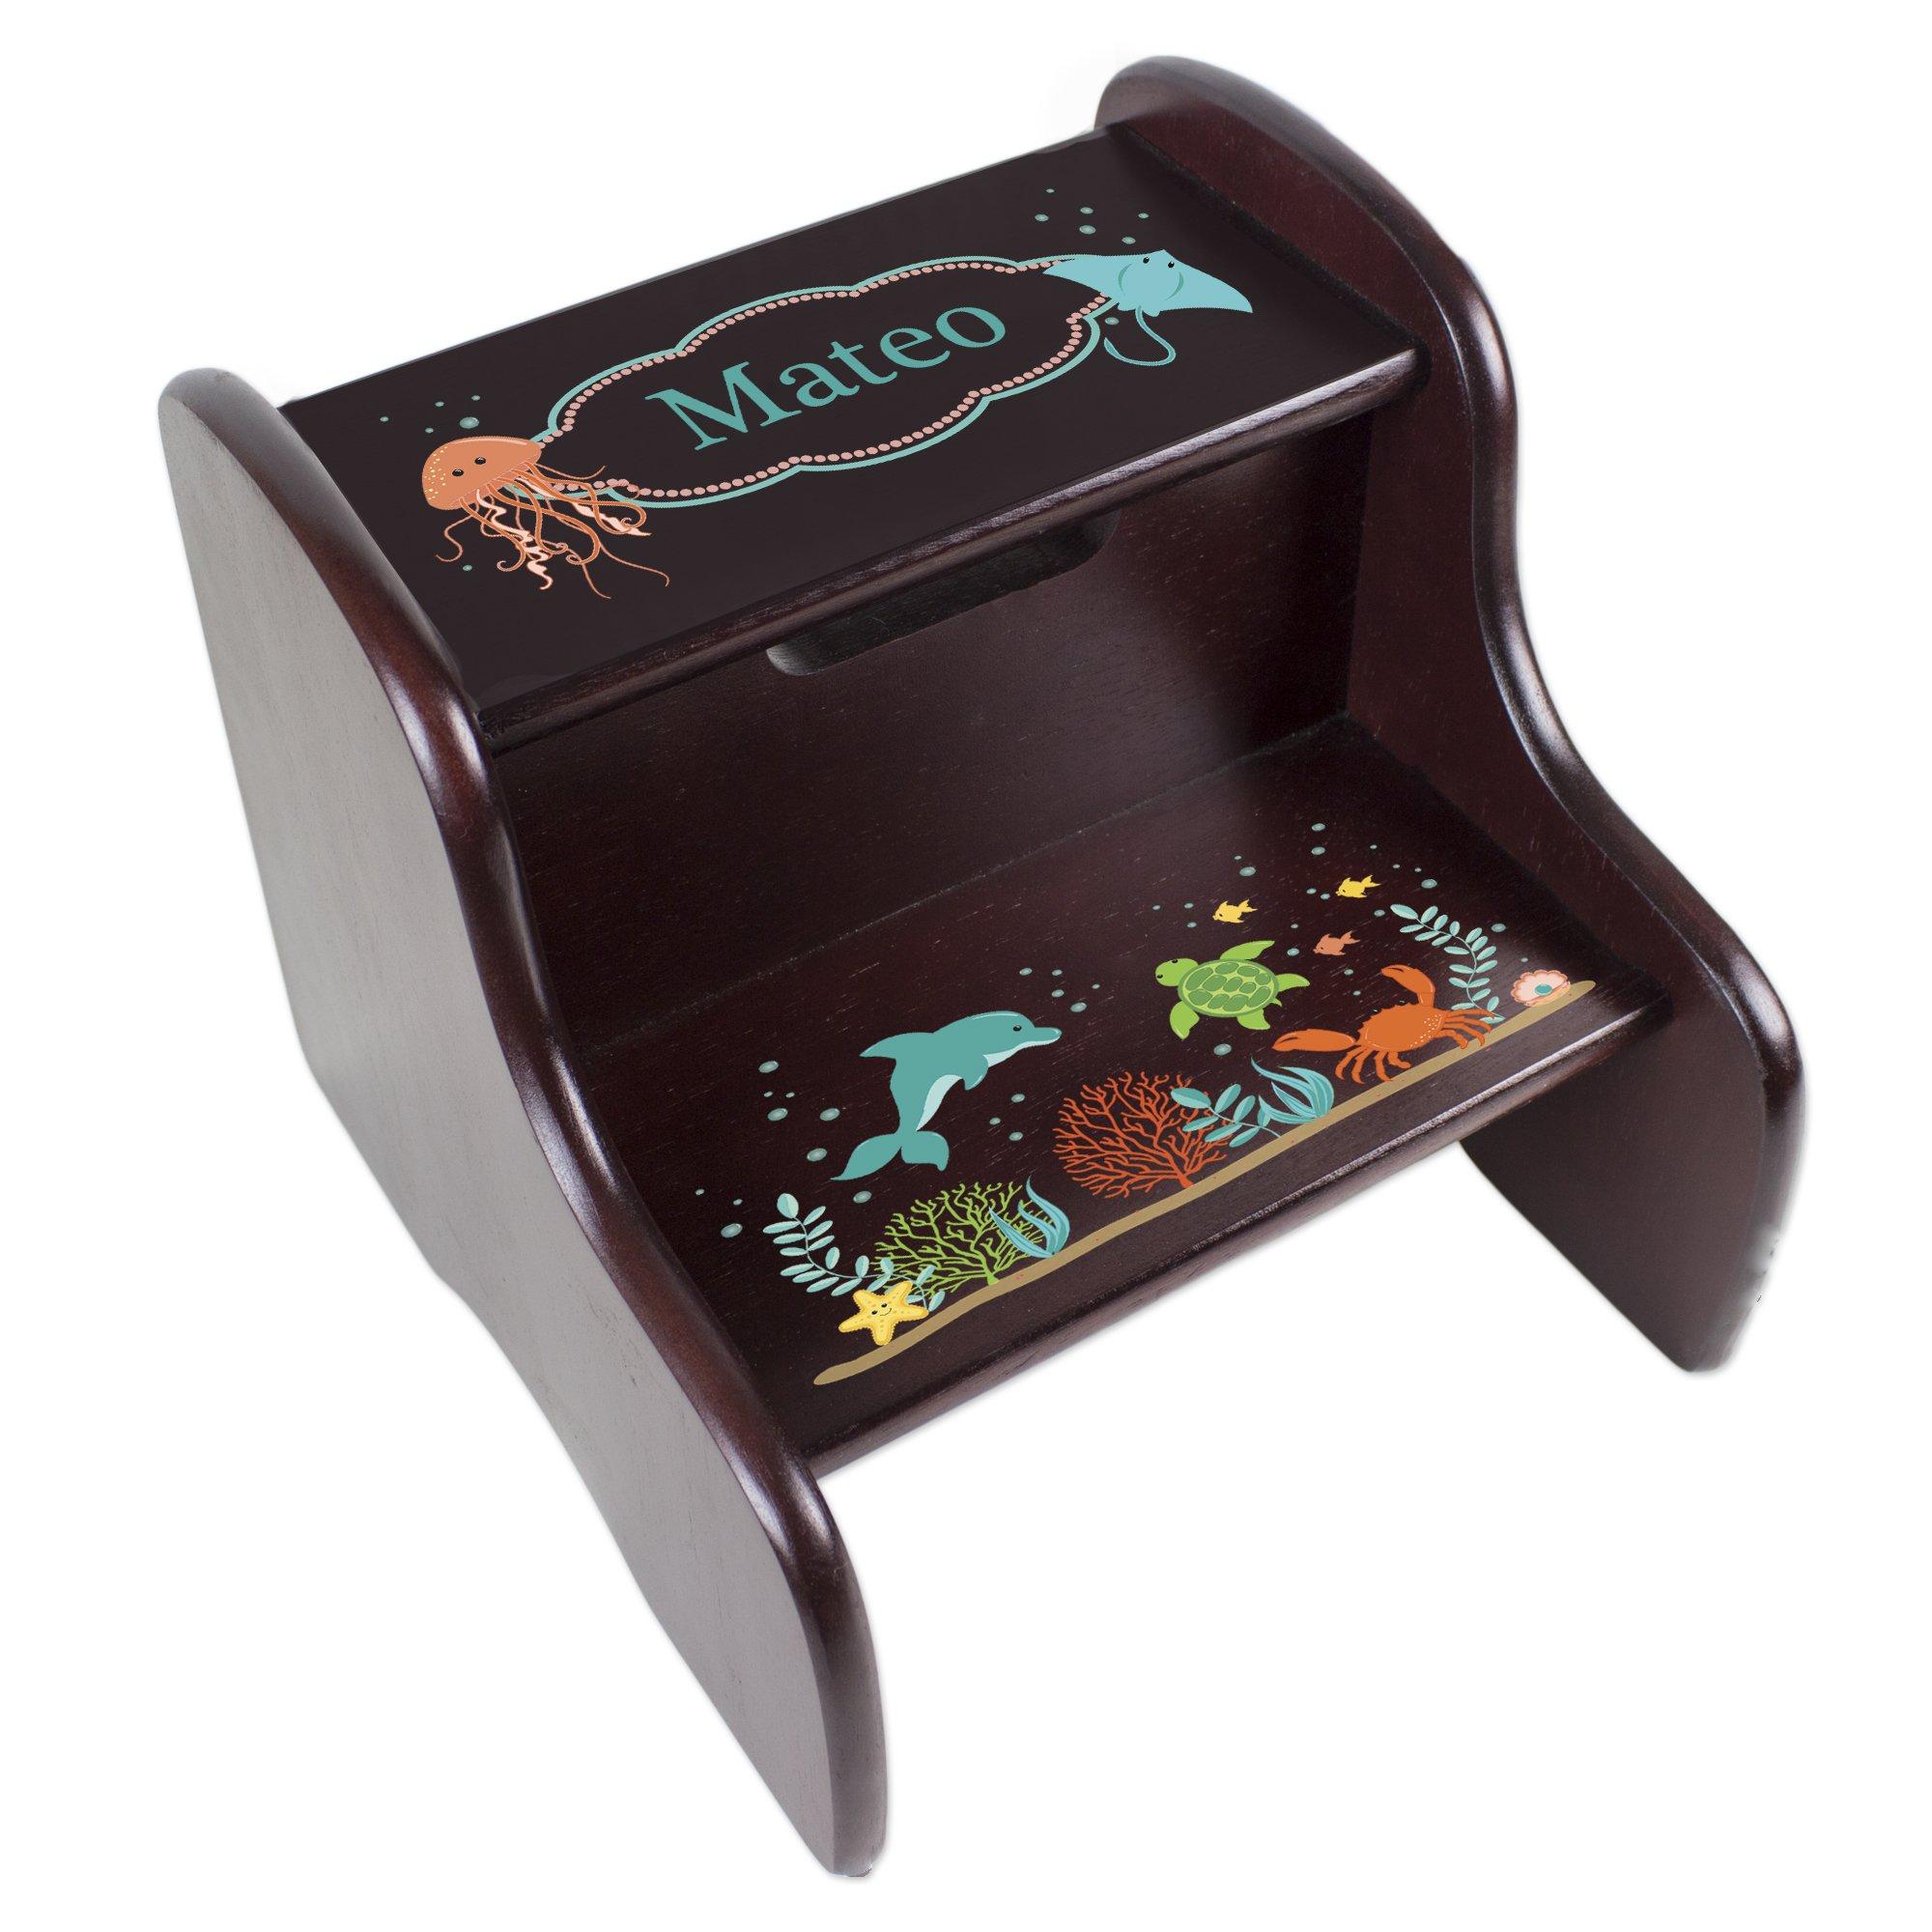 Personalized Espresso Sealife Step Stool